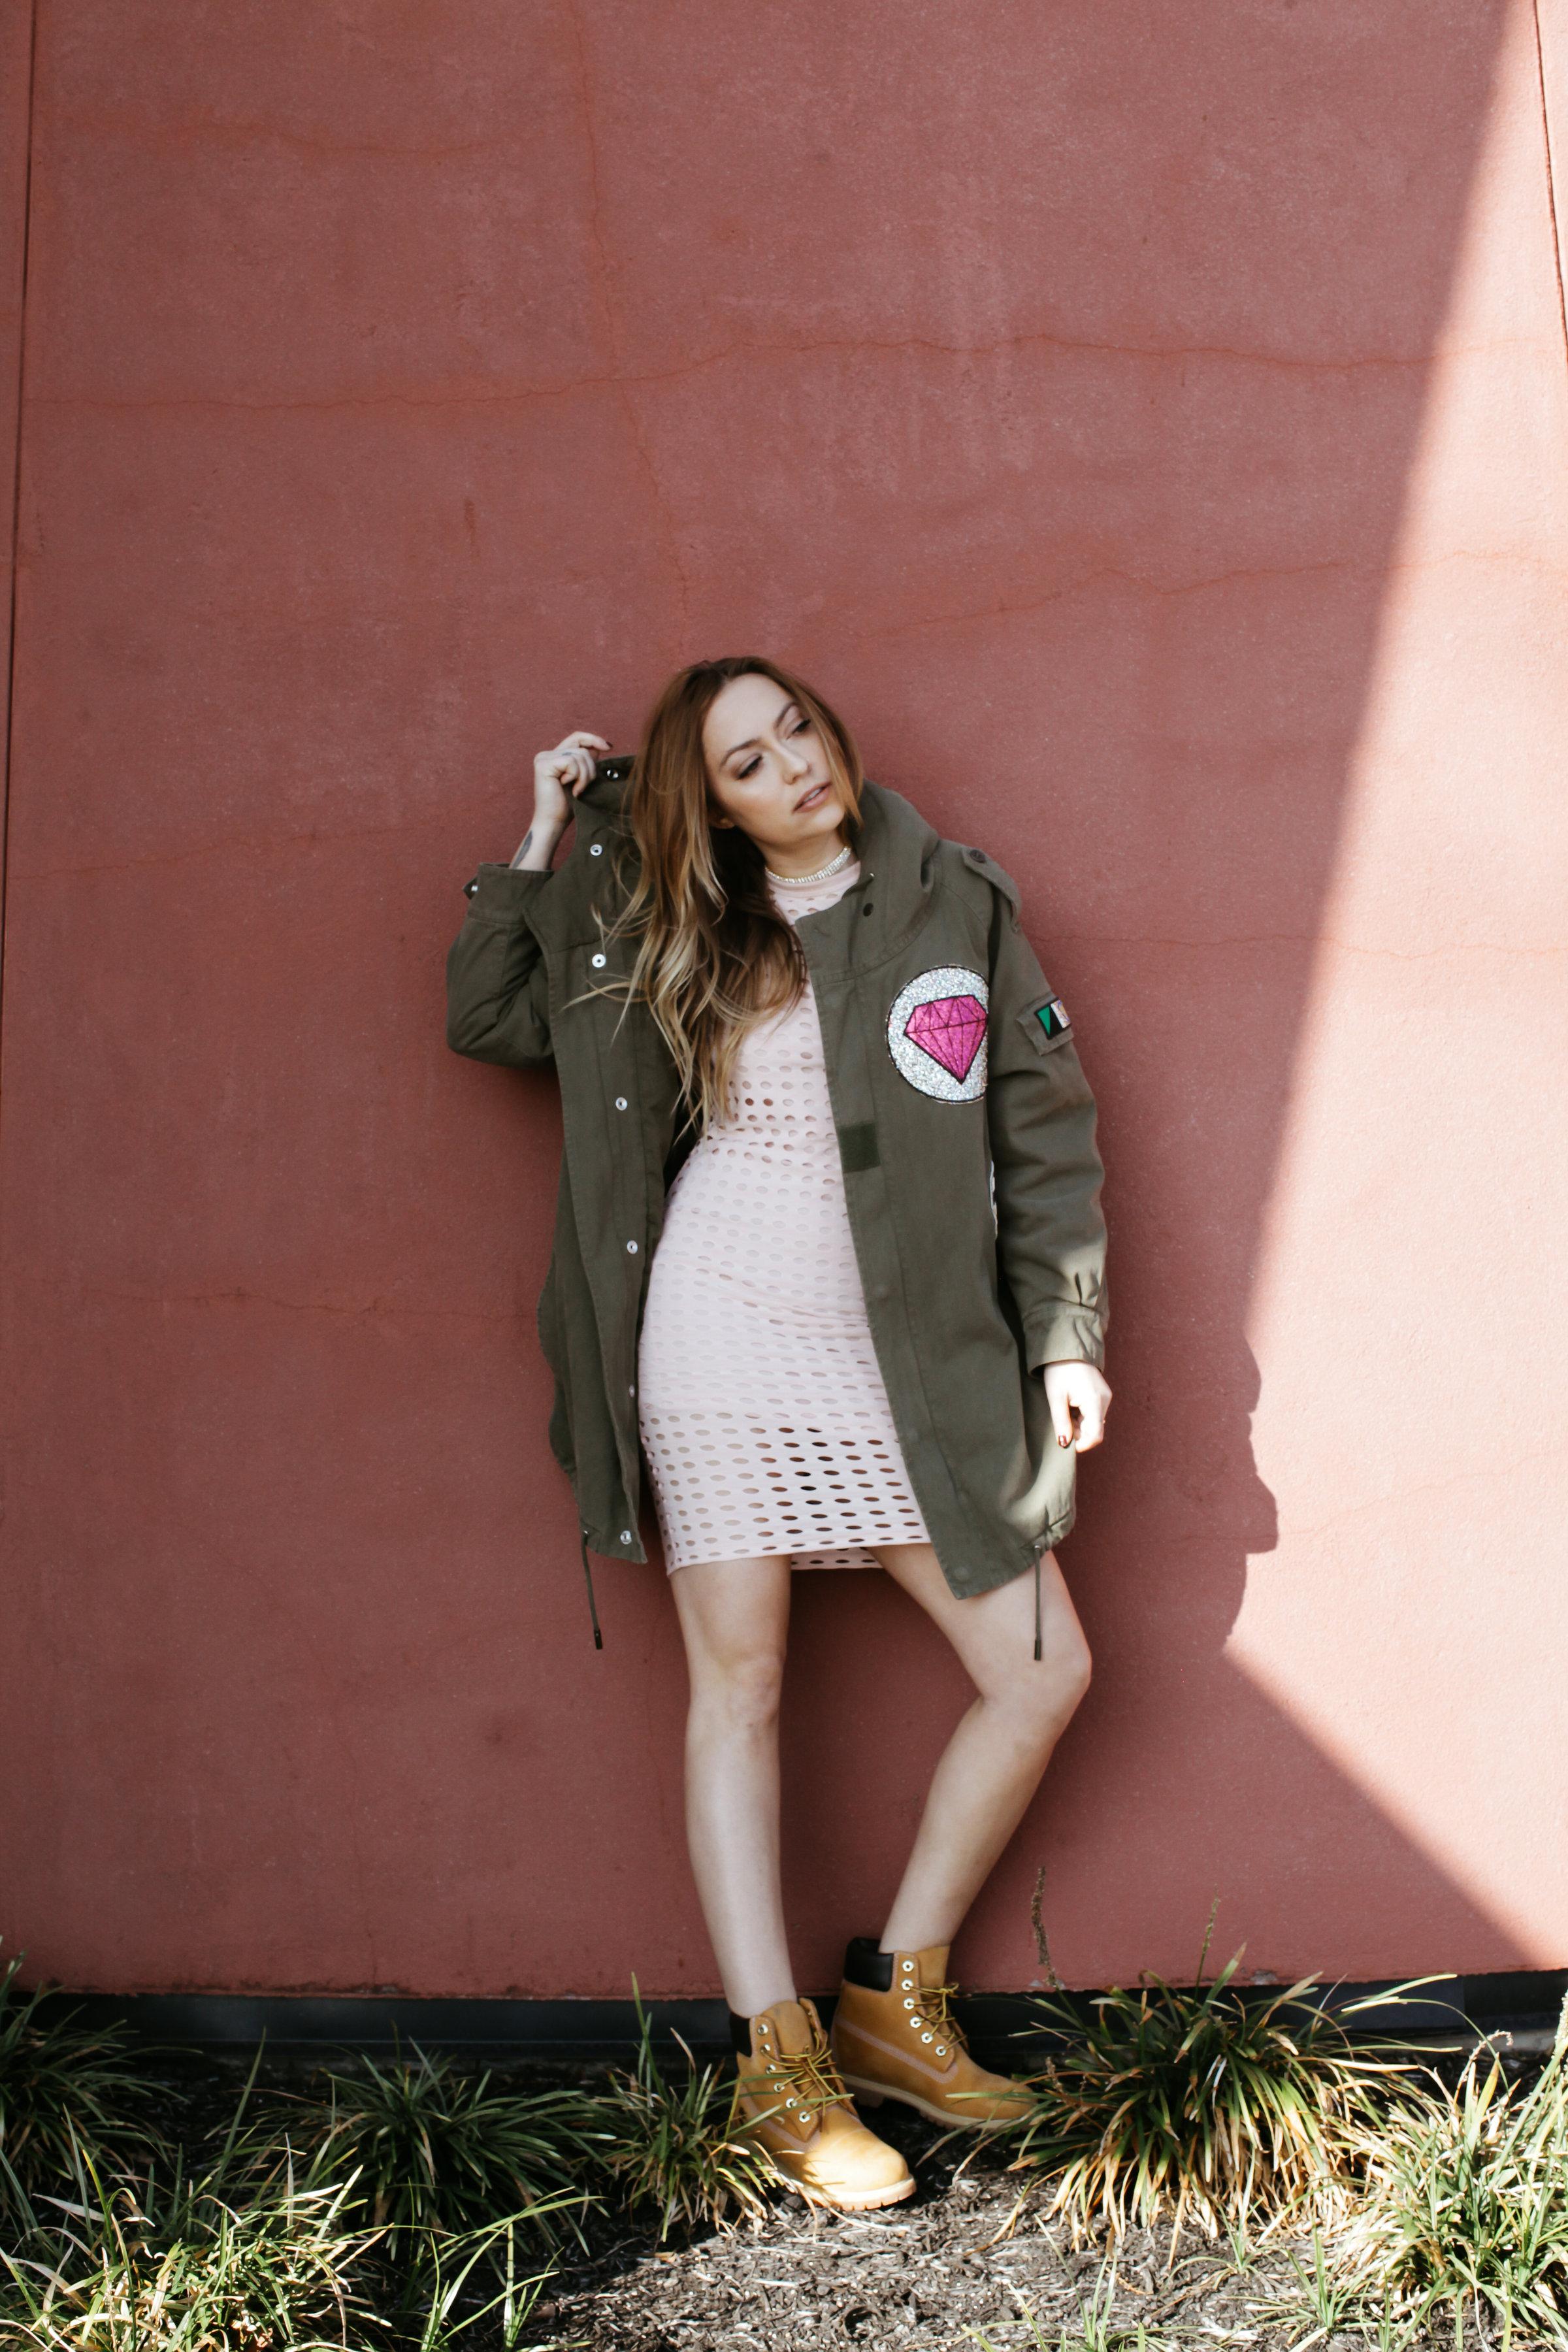 pink-dress-military-jacket.jpg